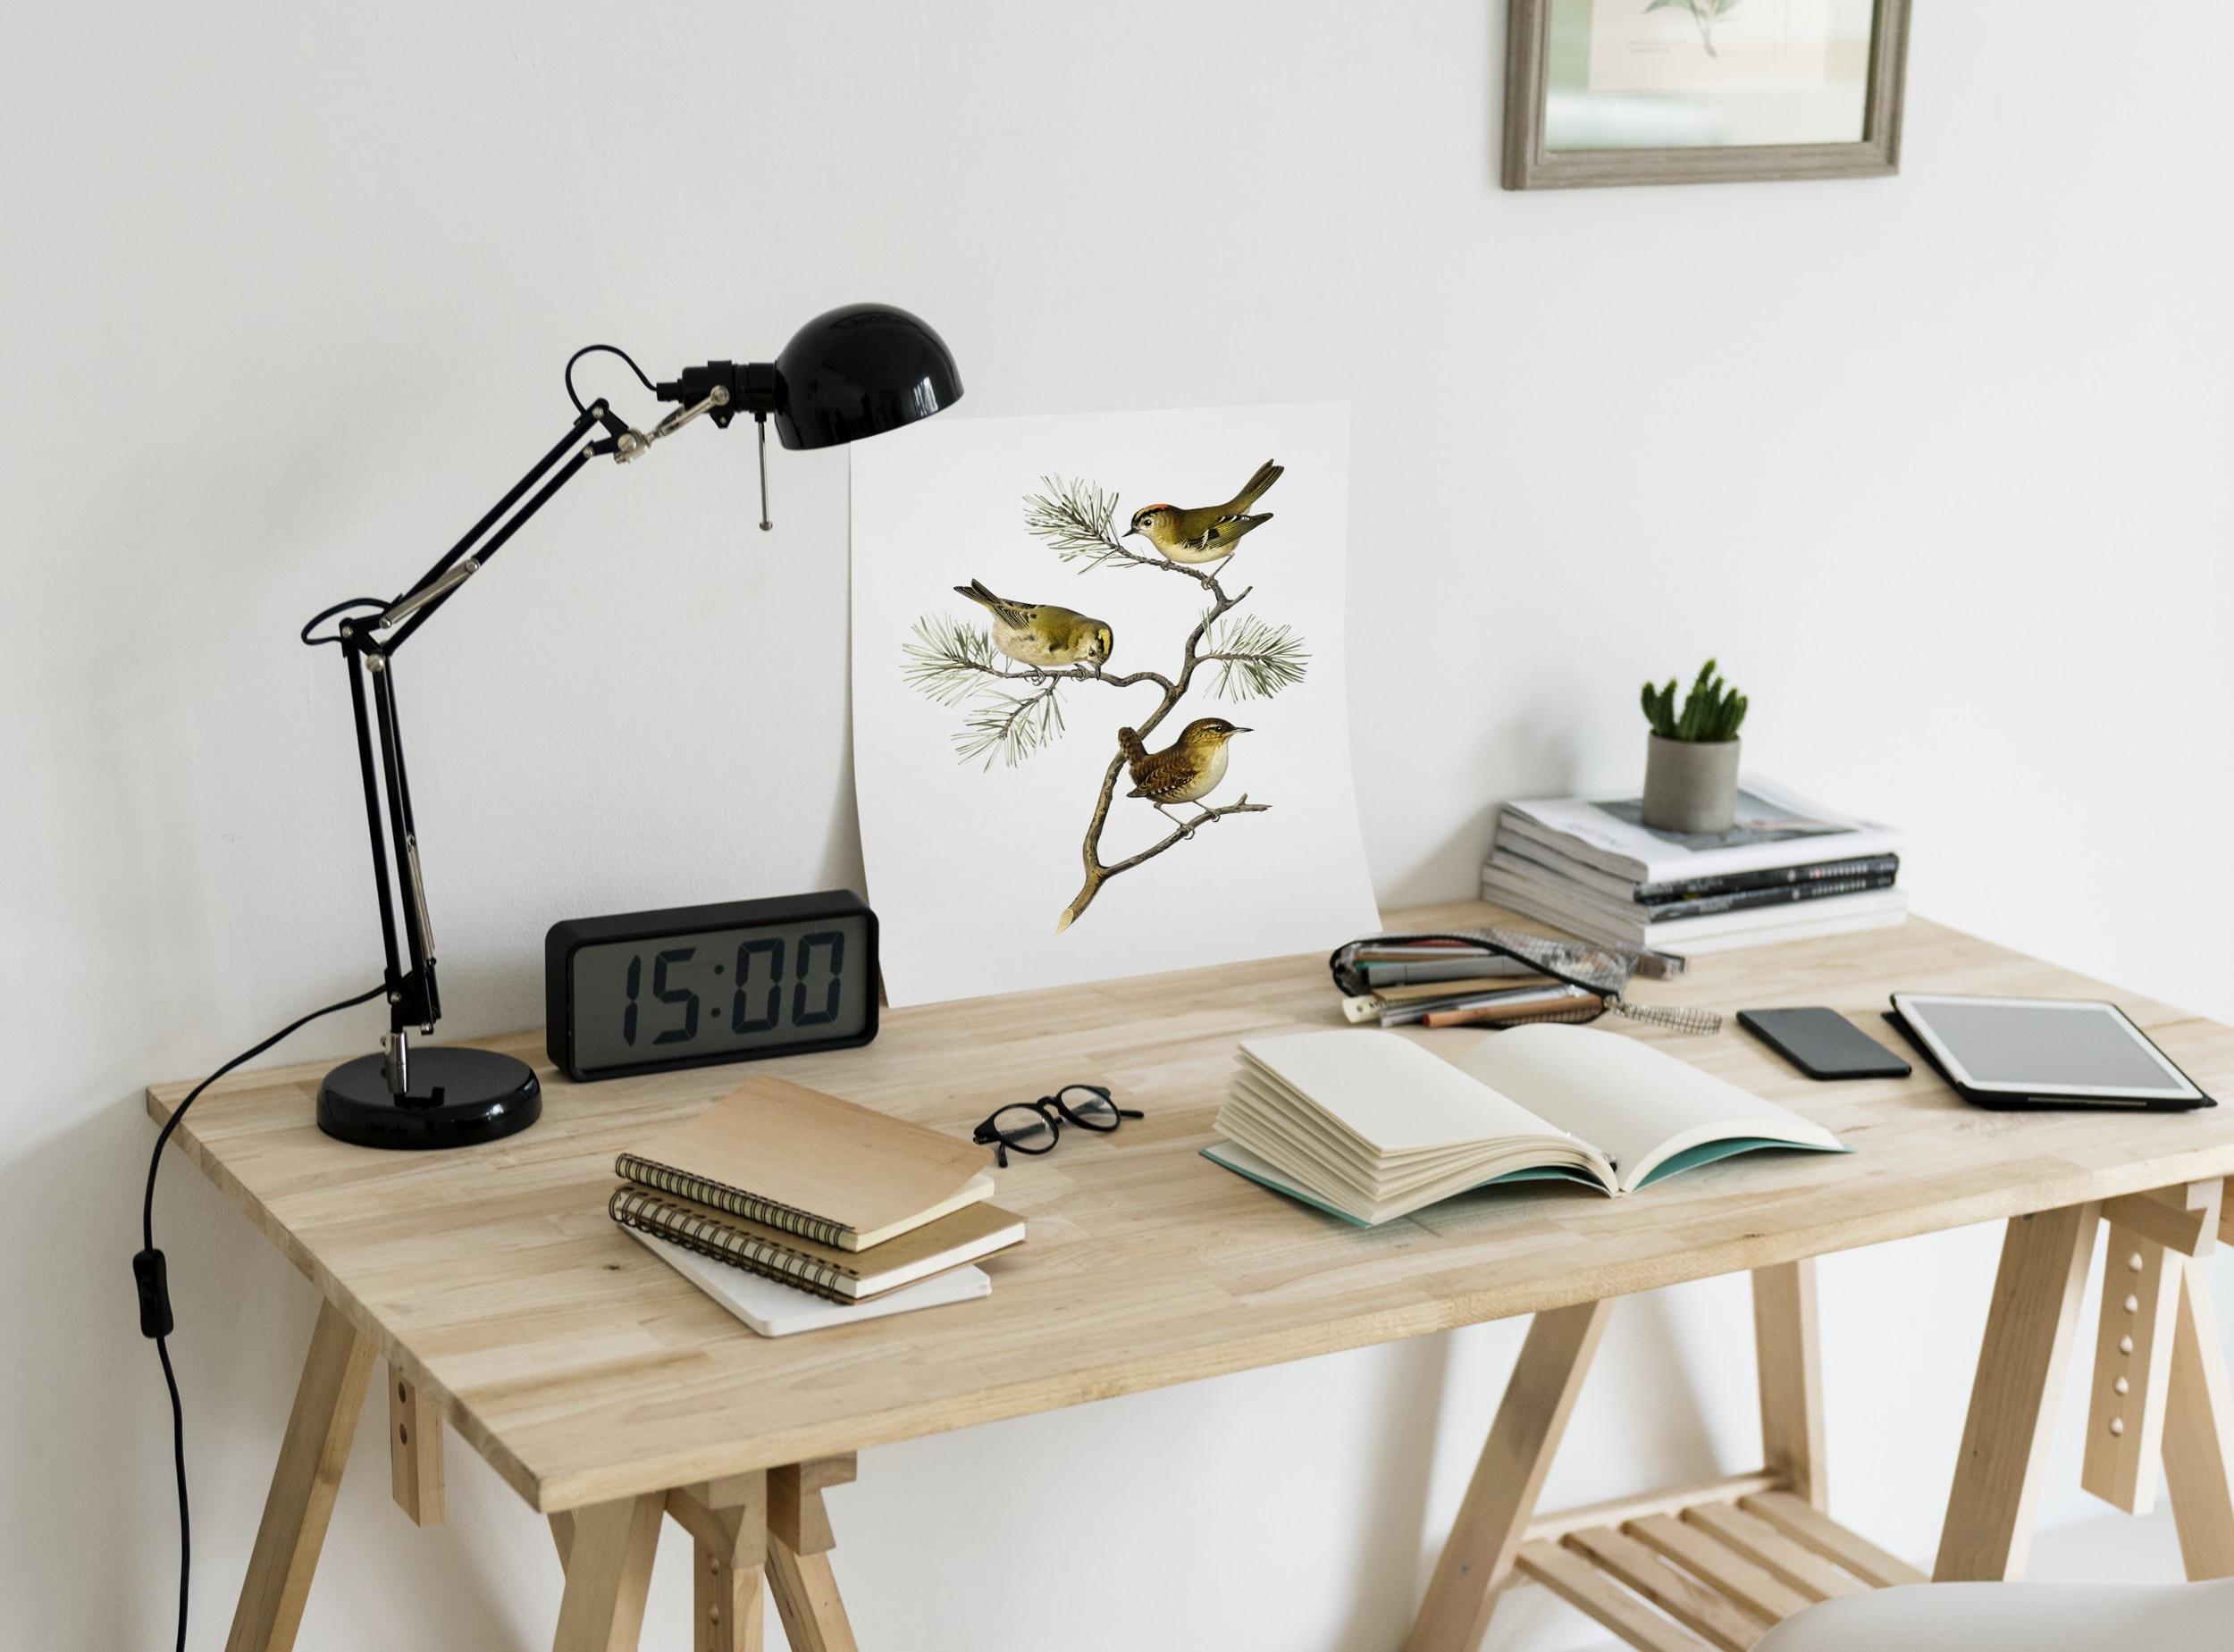 book, iPad, alarm clock, and desk lamp on table